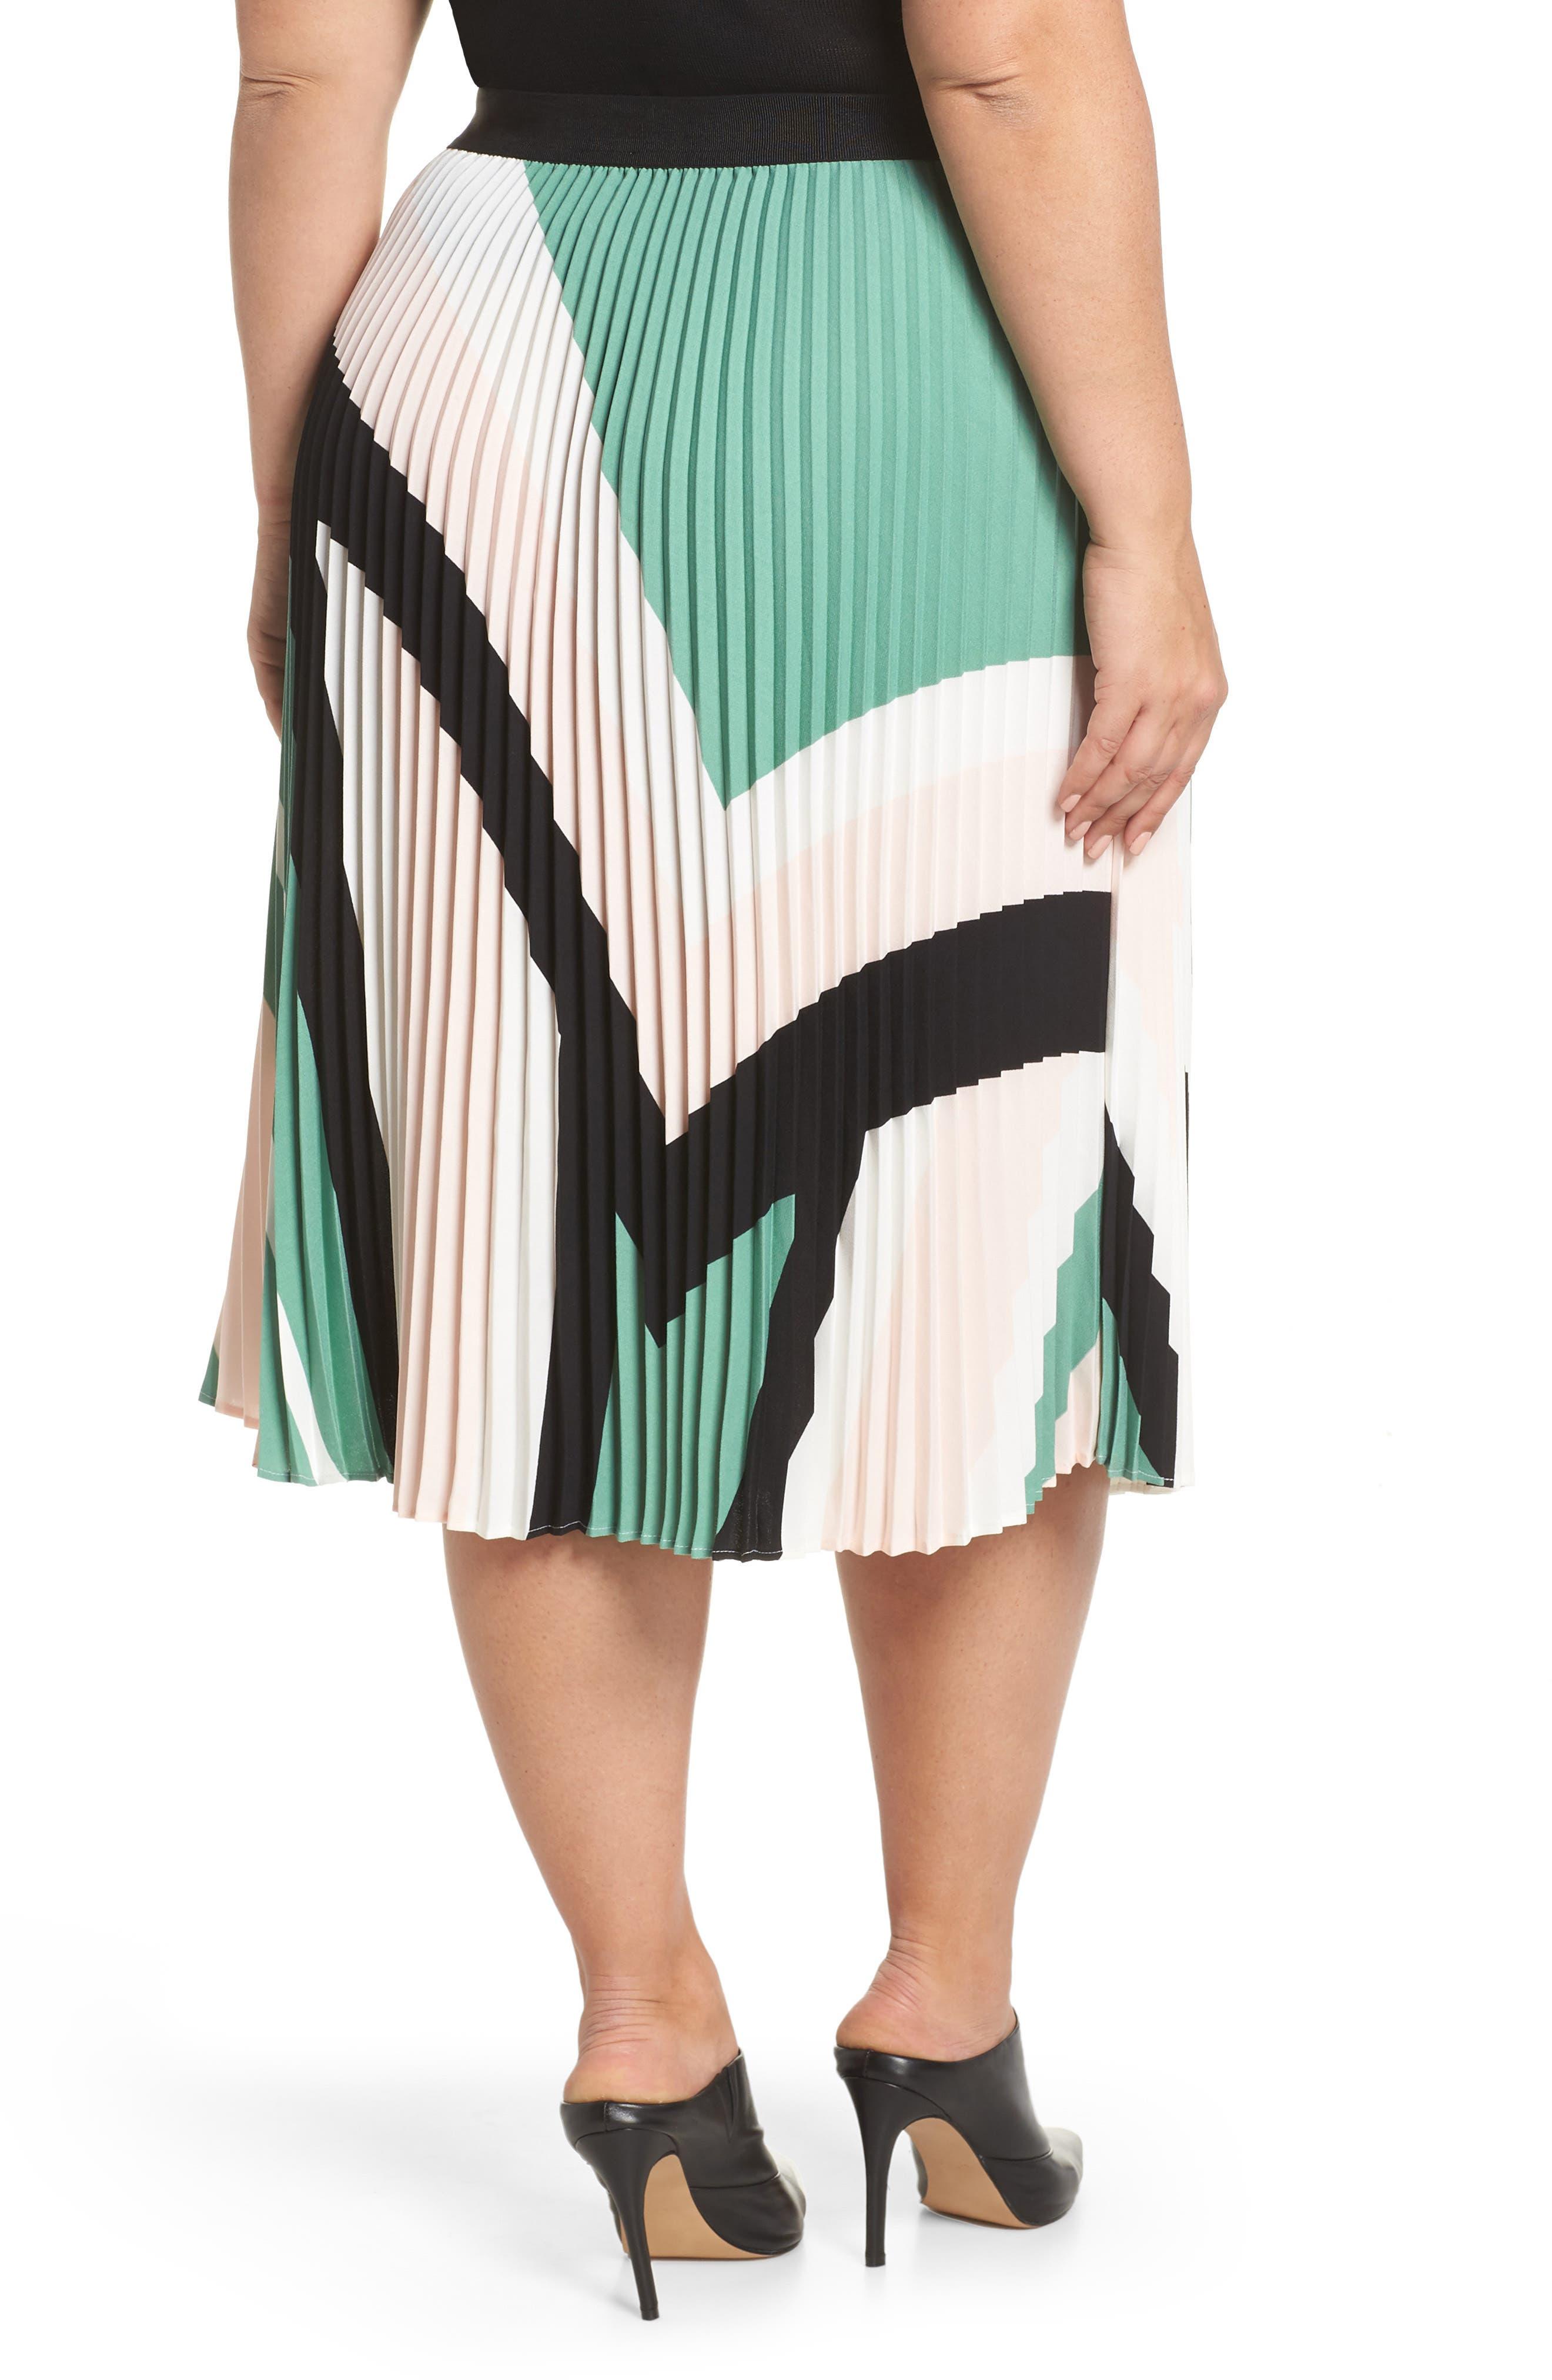 LEITH, Pleated Midi Skirt, Alternate thumbnail 8, color, PINK CHINTZ TRIANGLE STRIPE